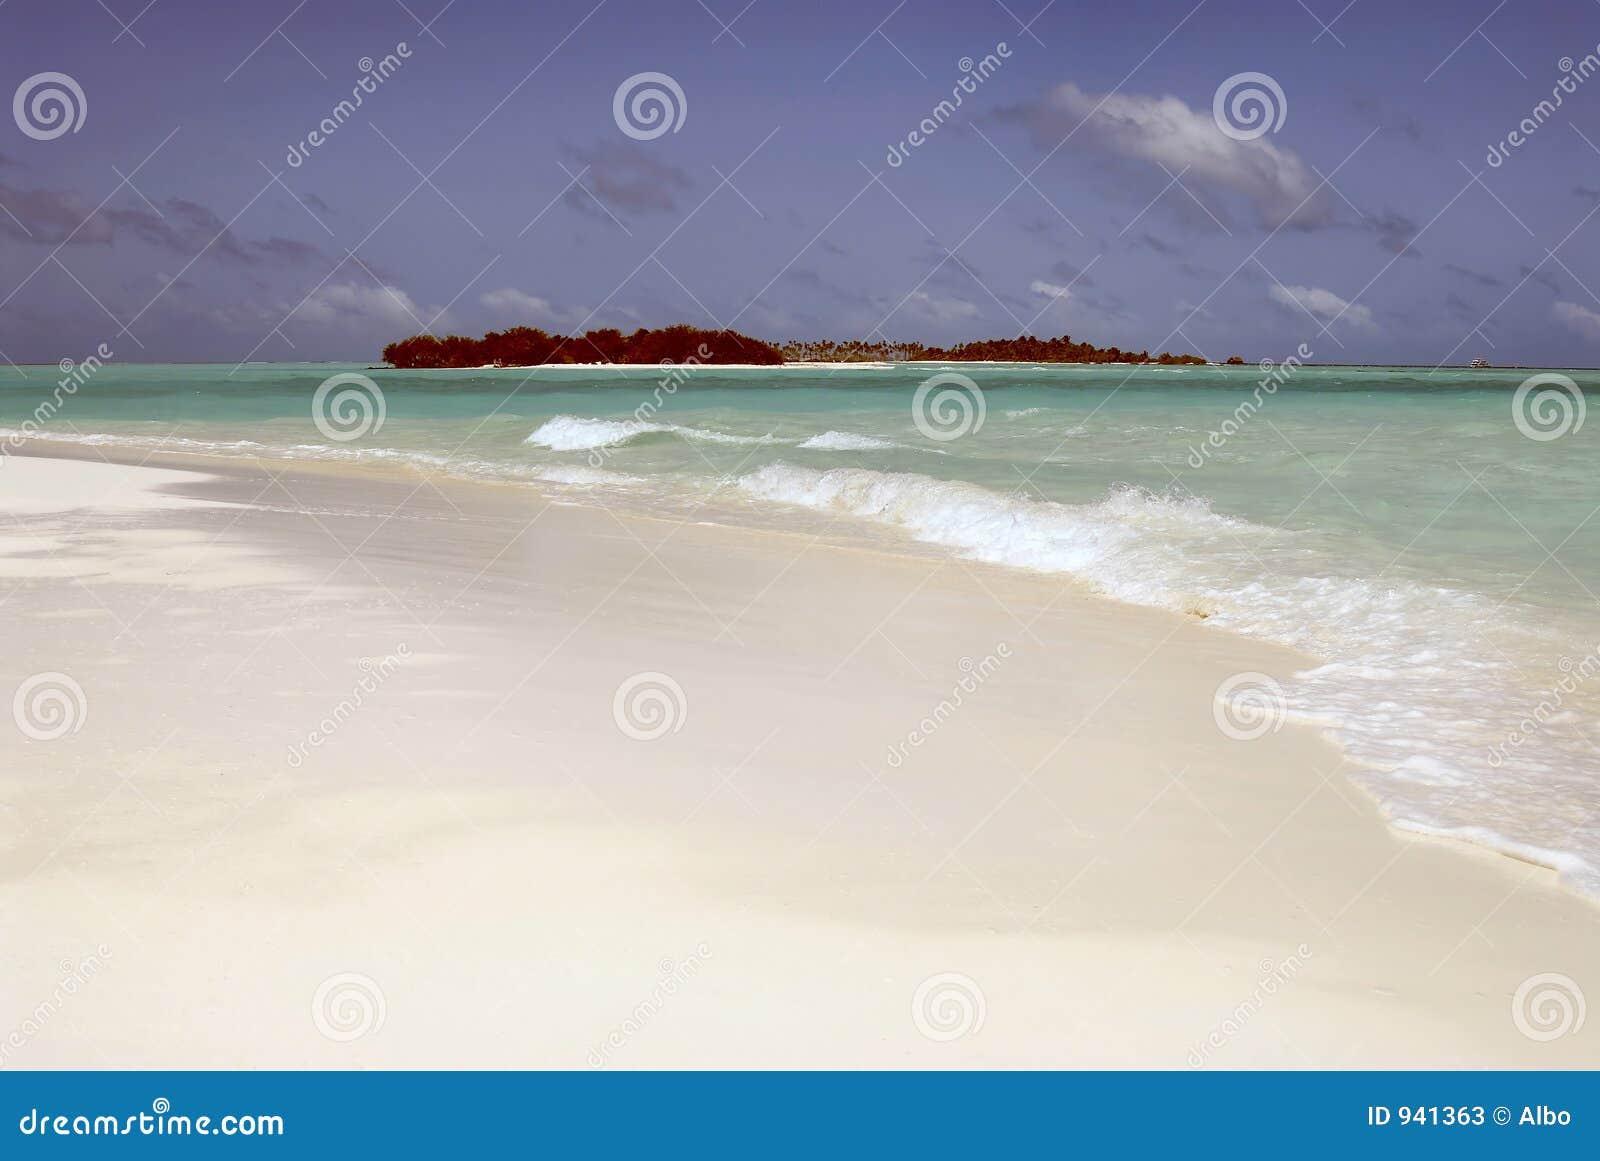 Maledivische Insel